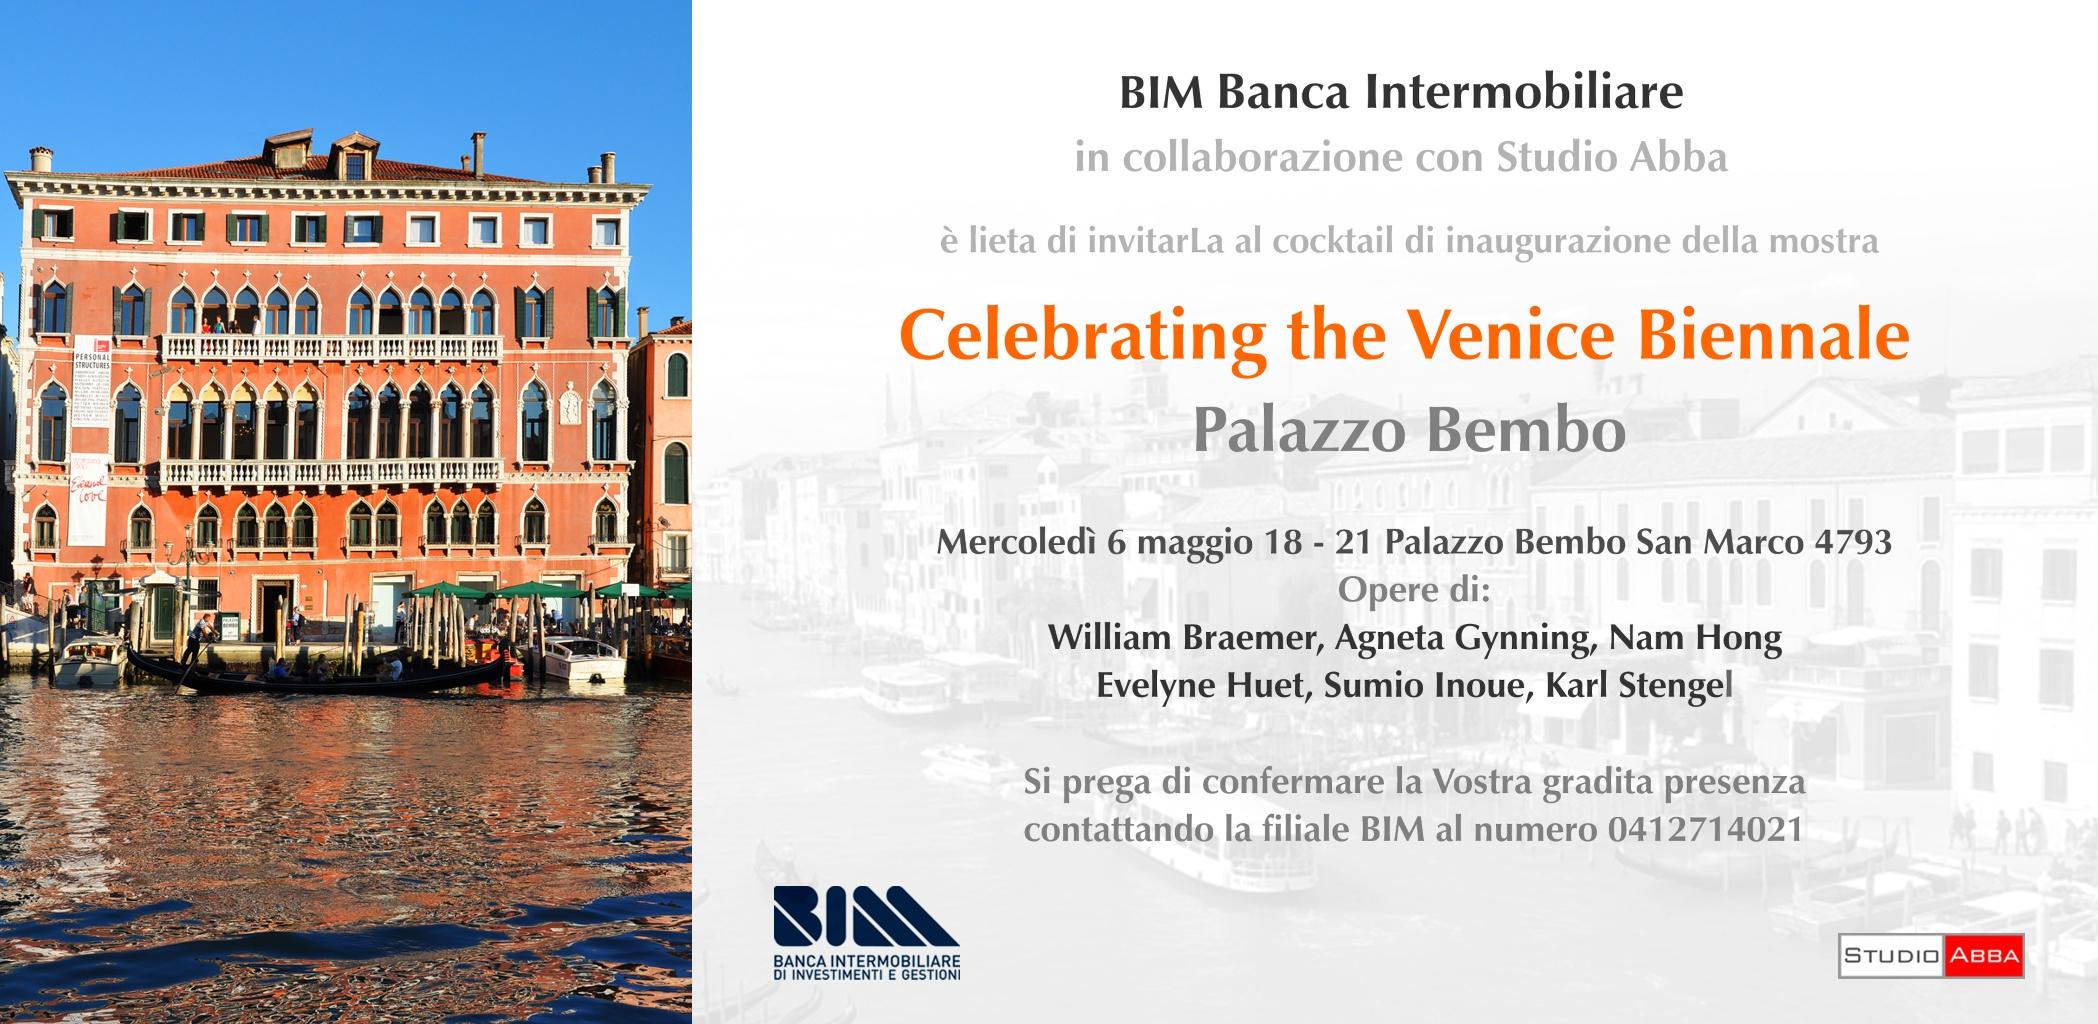 6 maggio BIM - Studio Abba - Palazzo Bembo Venezia